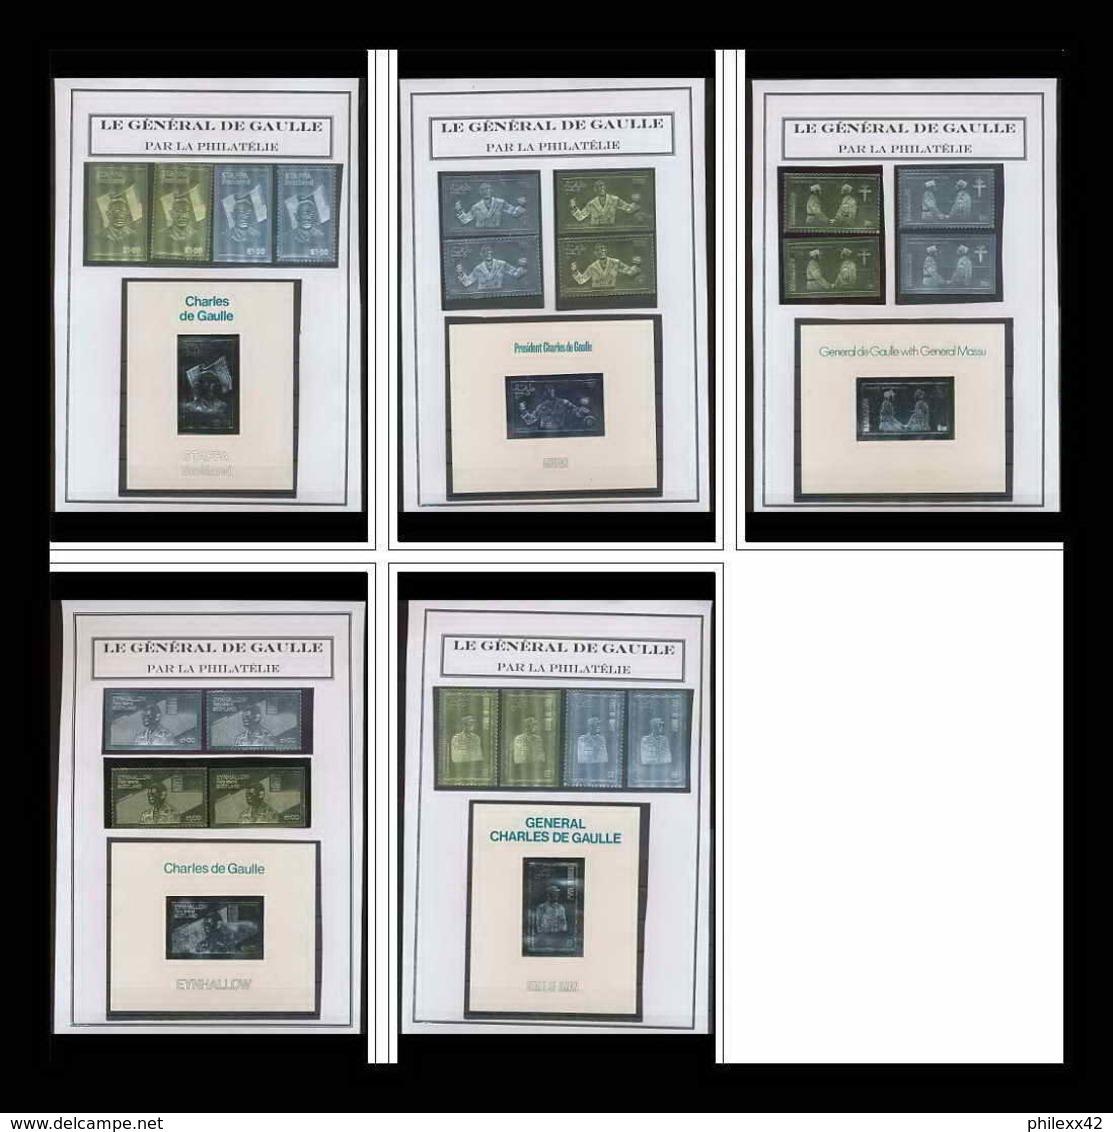 260 Charles De Gaulle - Neuf ** MNH Collection De Timbres OR (gold Stamps) Et Argent épreuve De Luxe / Deluxe Proof - Collections (en Albums)